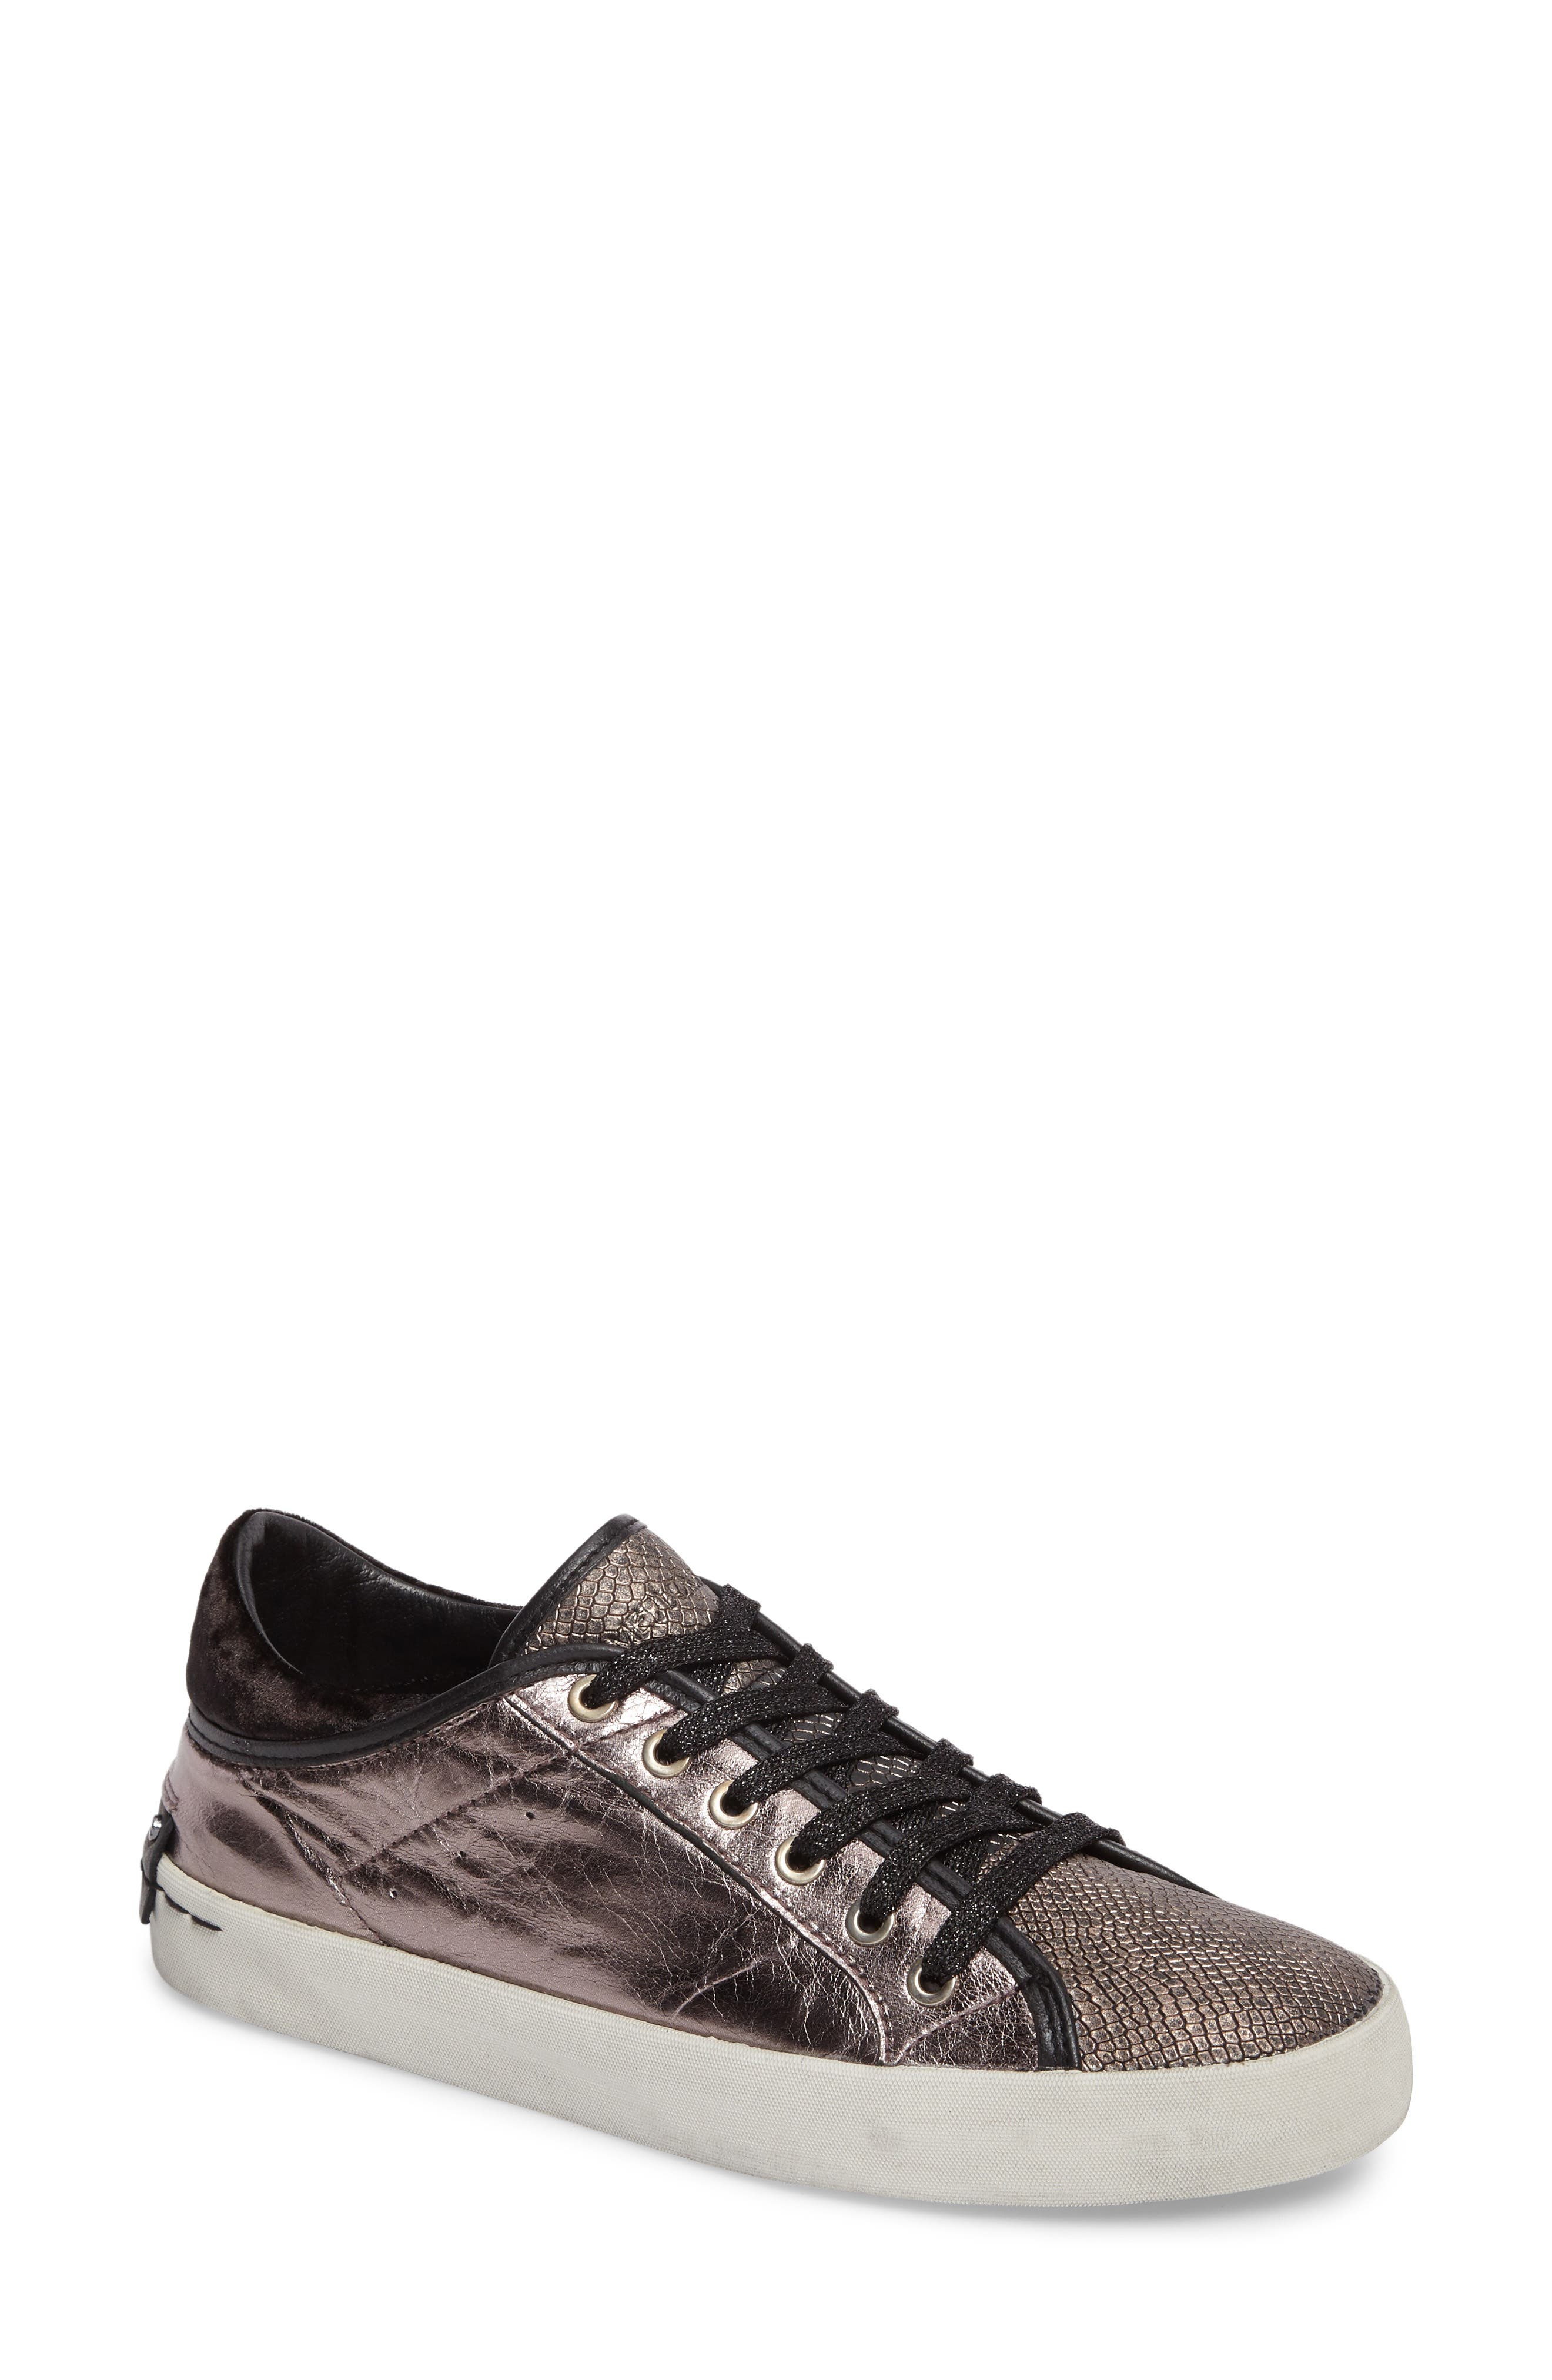 Faith Sneaker,                         Main,                         color, 040